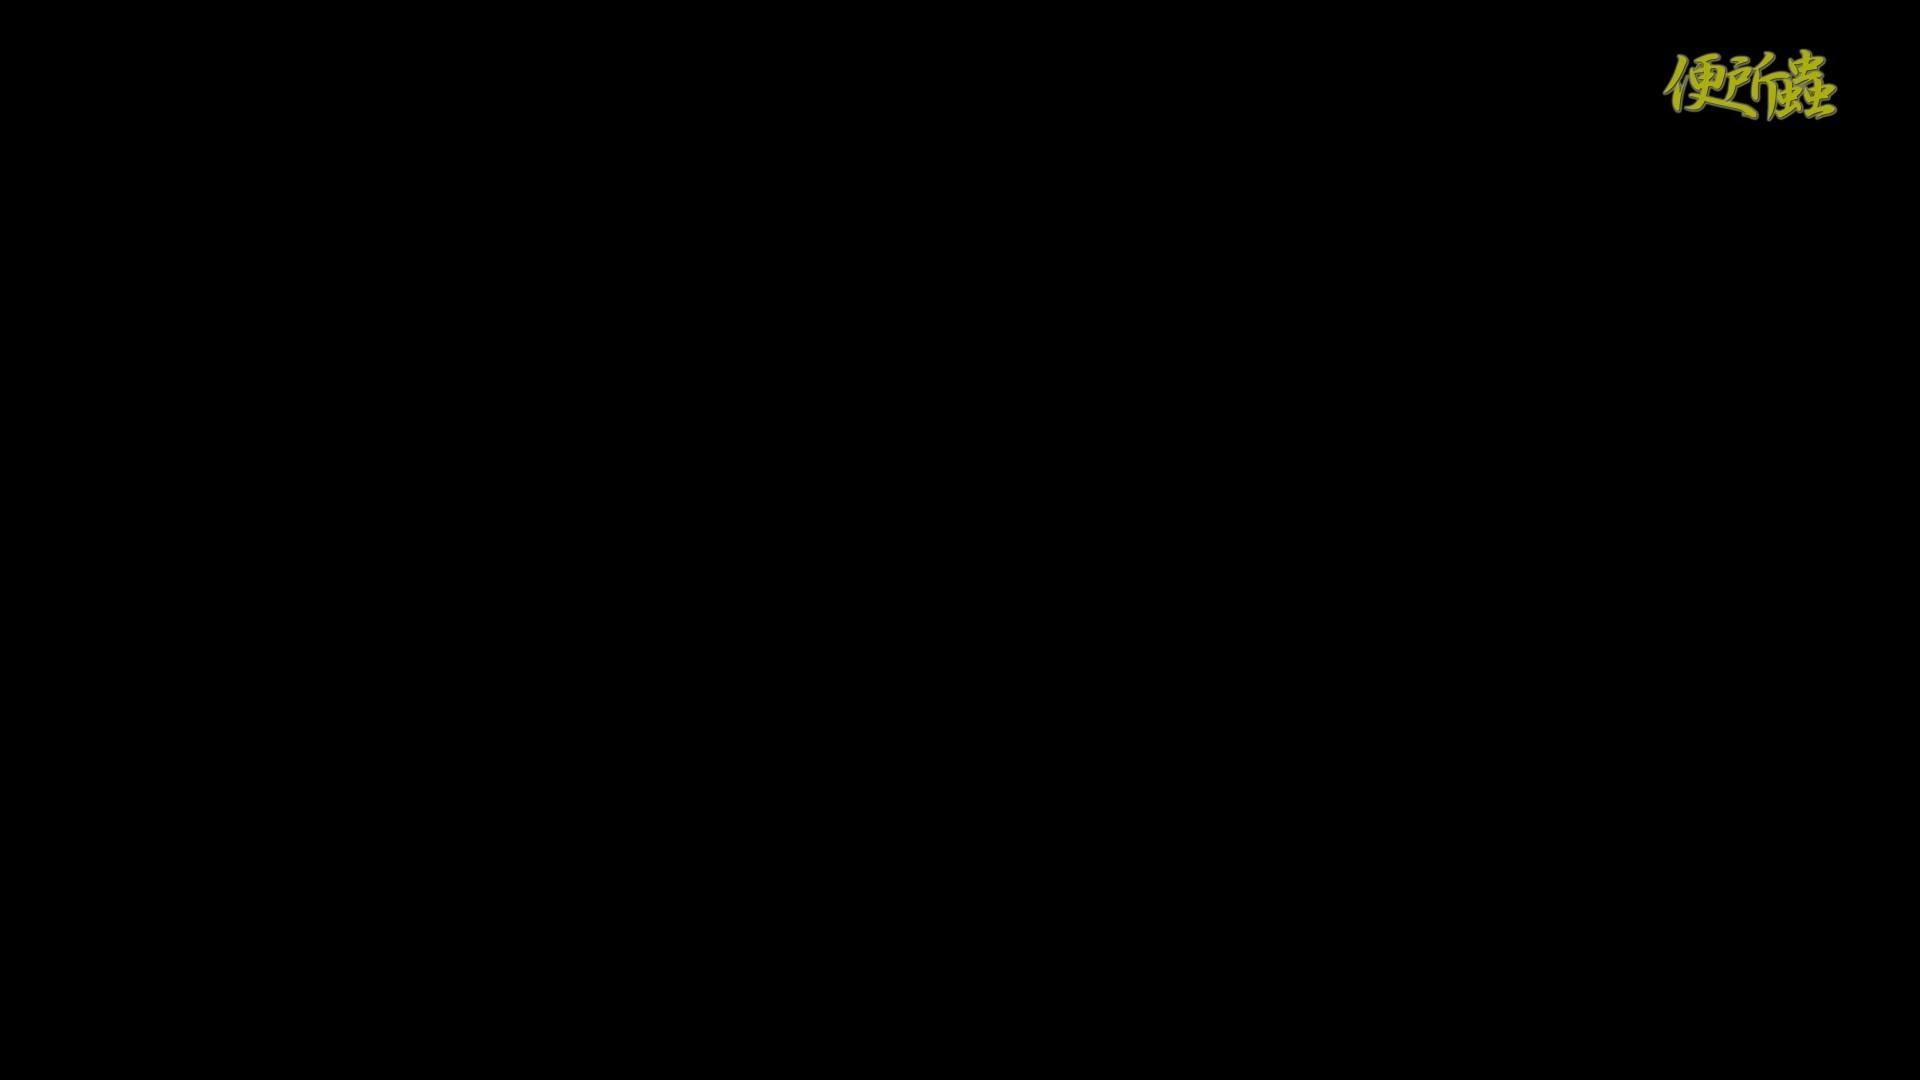 vol.04 便所蟲さんのリターン~寺子屋洗面所盗撮~ 盛合せ エロ画像 102画像 68